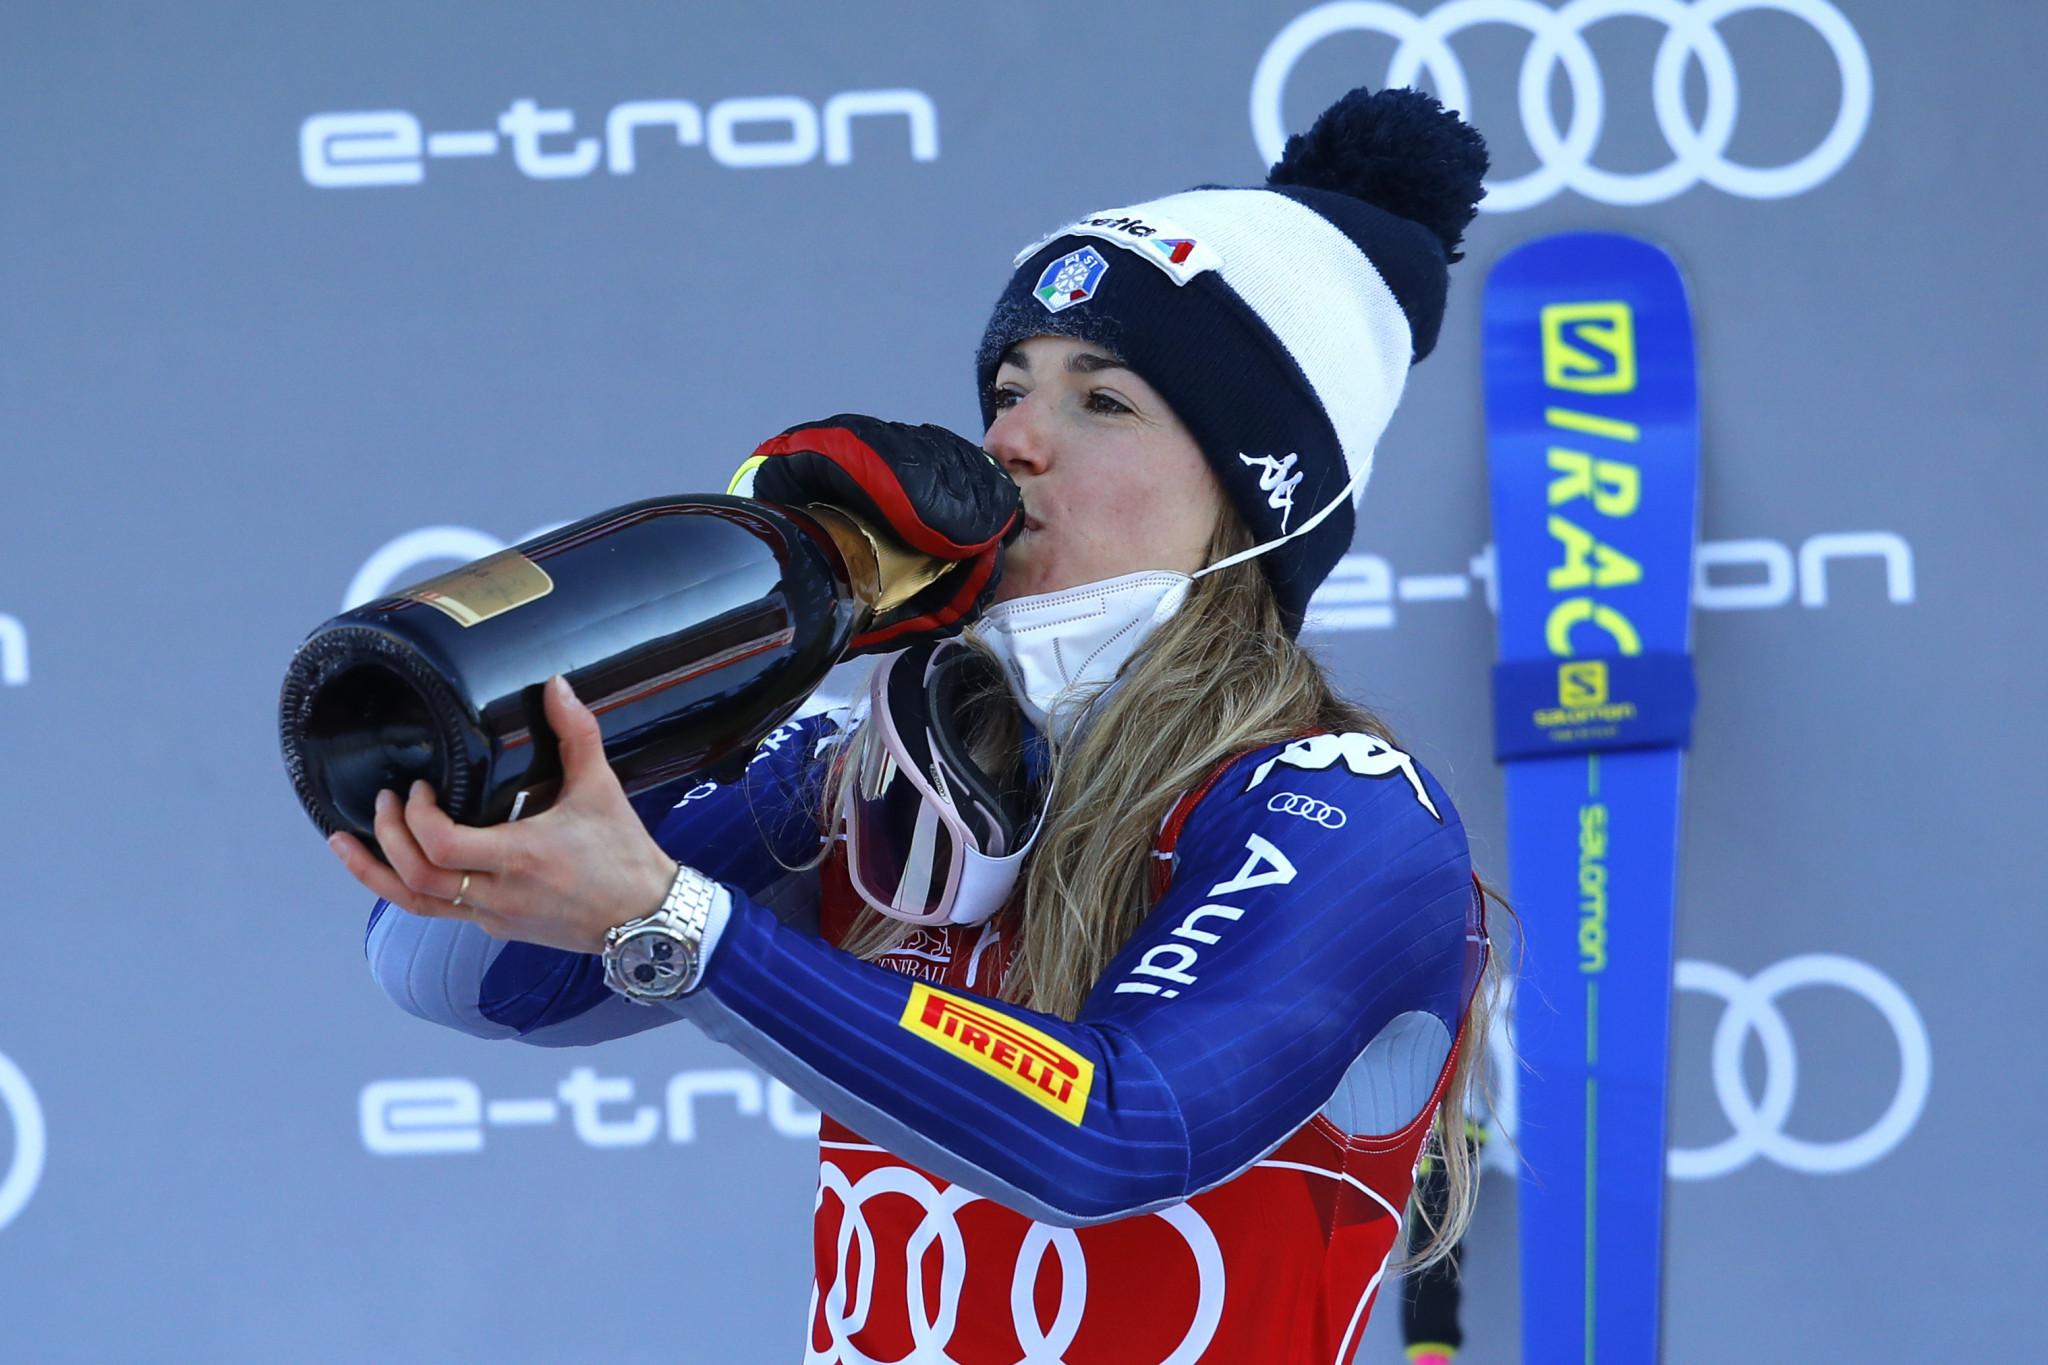 Marta Bassino has three giant slalom World Cup wins this season ©Getty Images